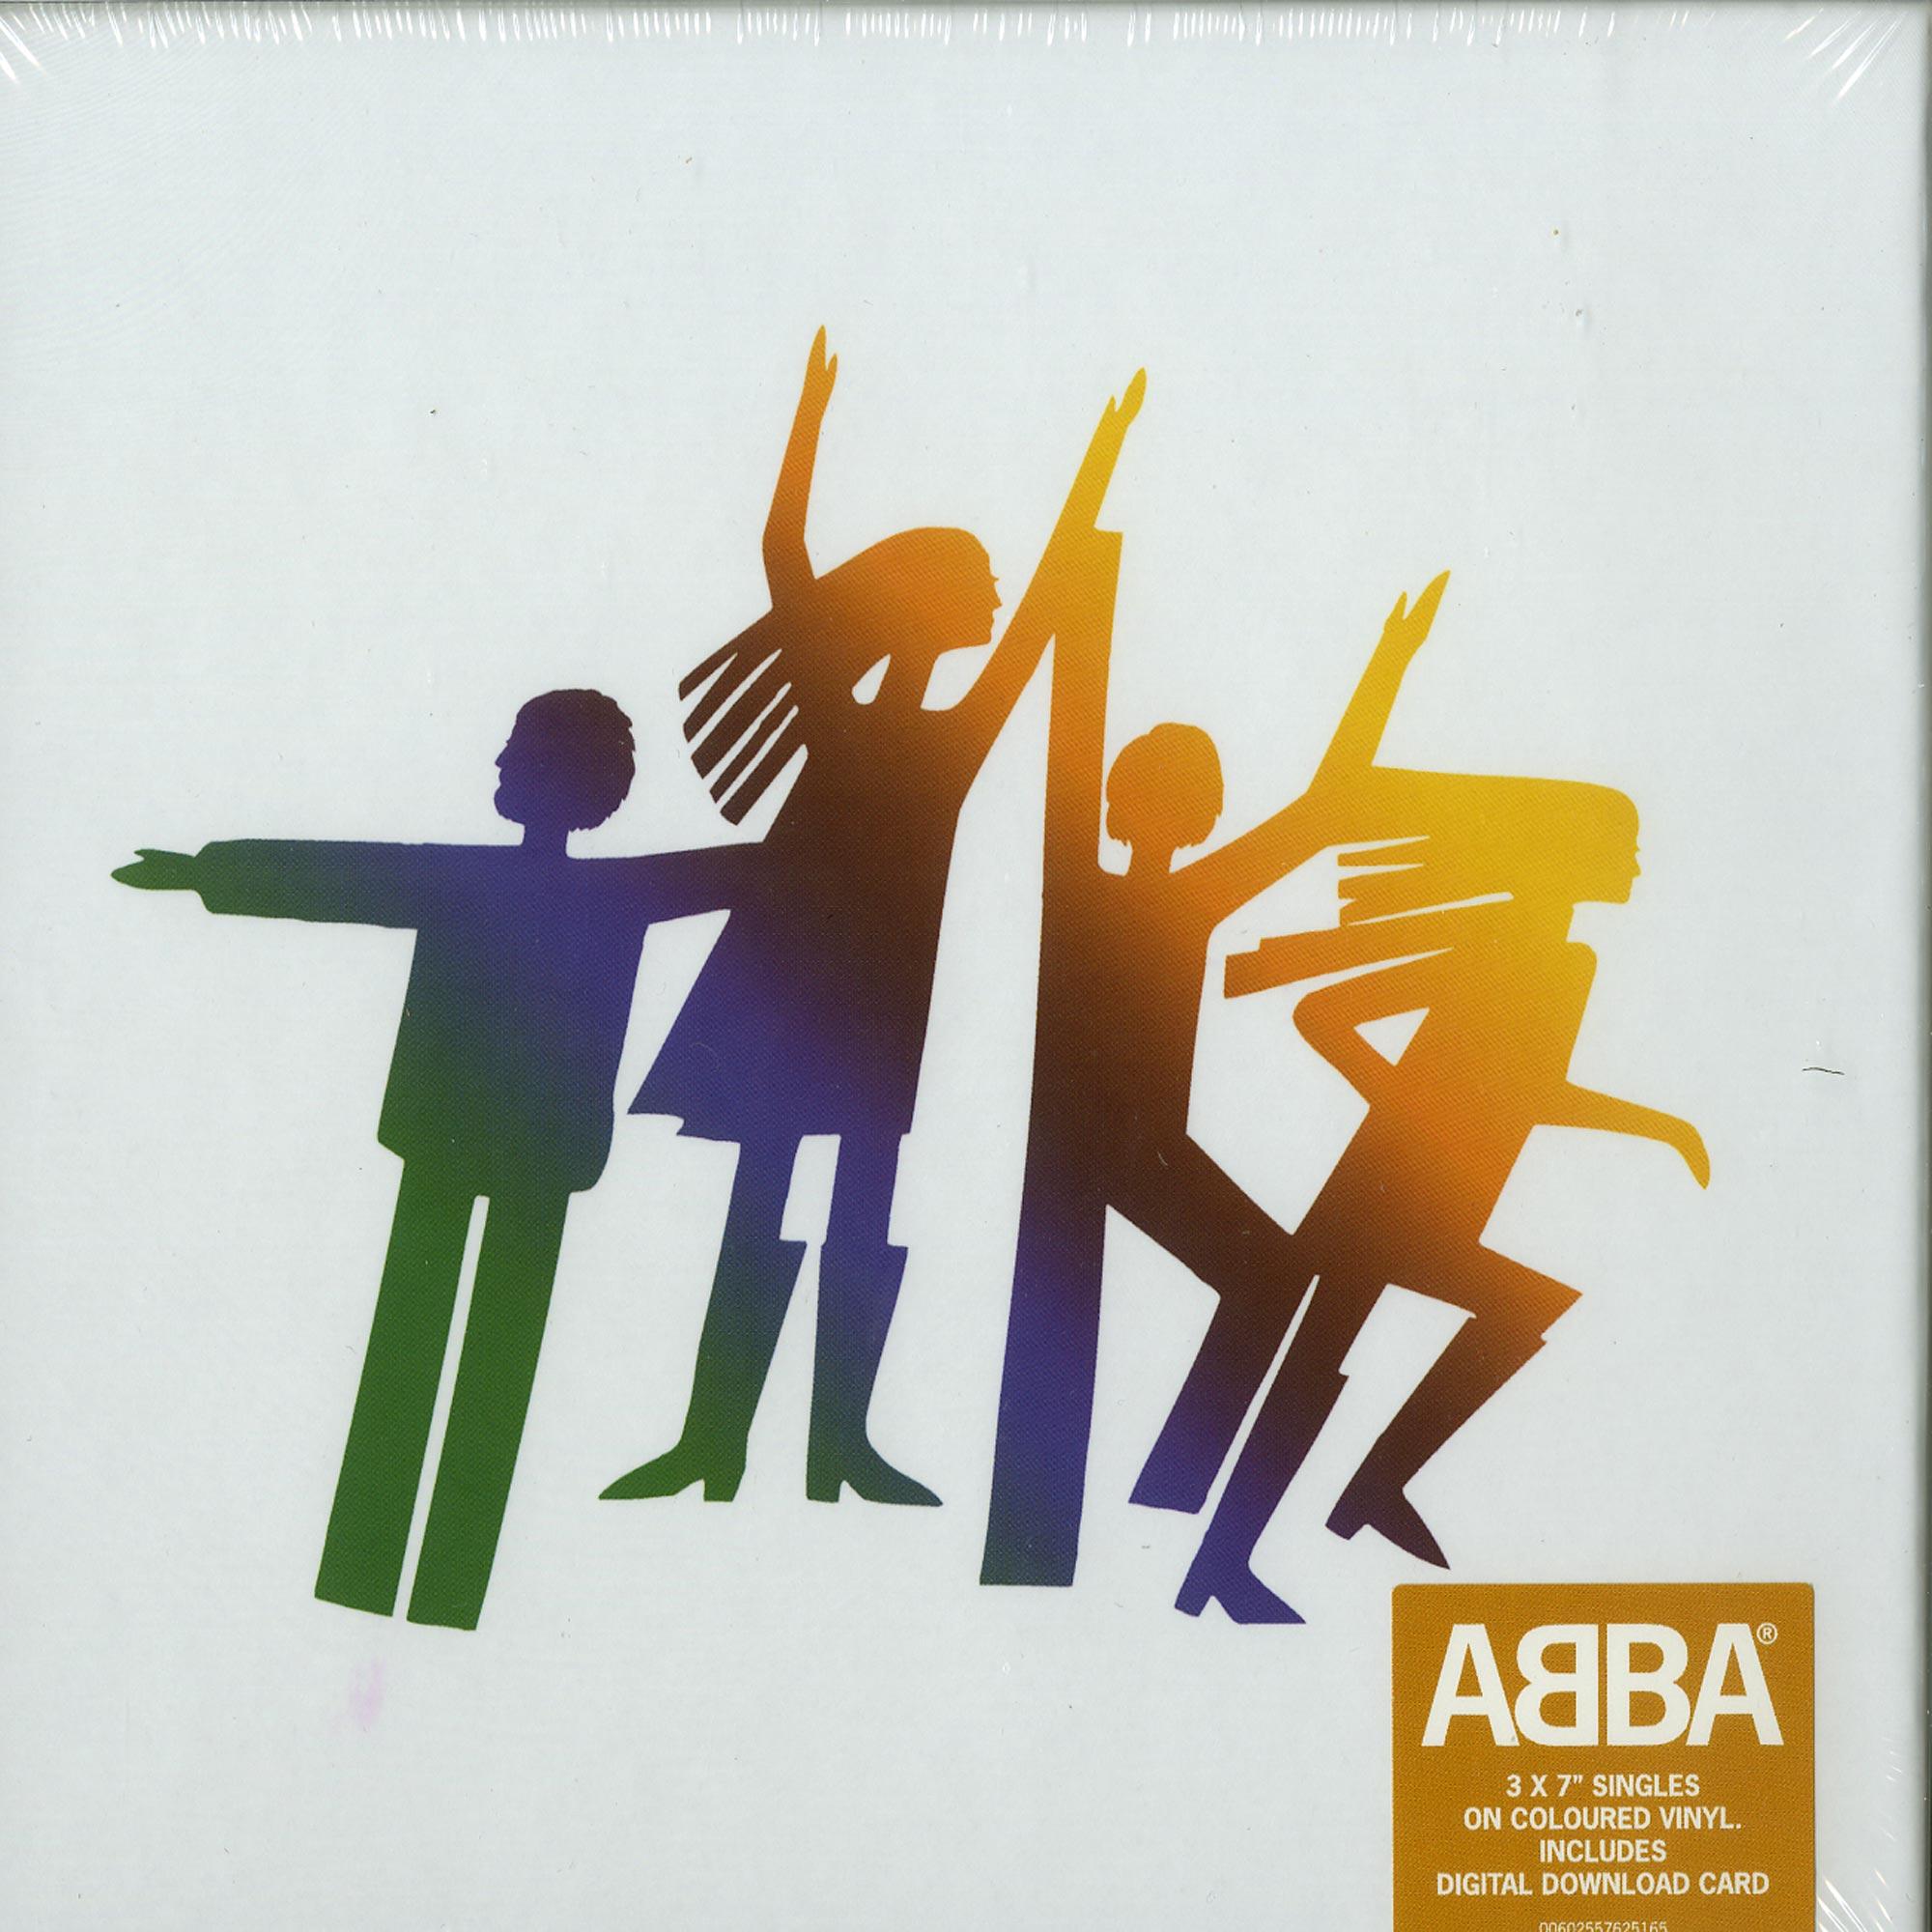 ABBA - ABBA - THE SINGLES